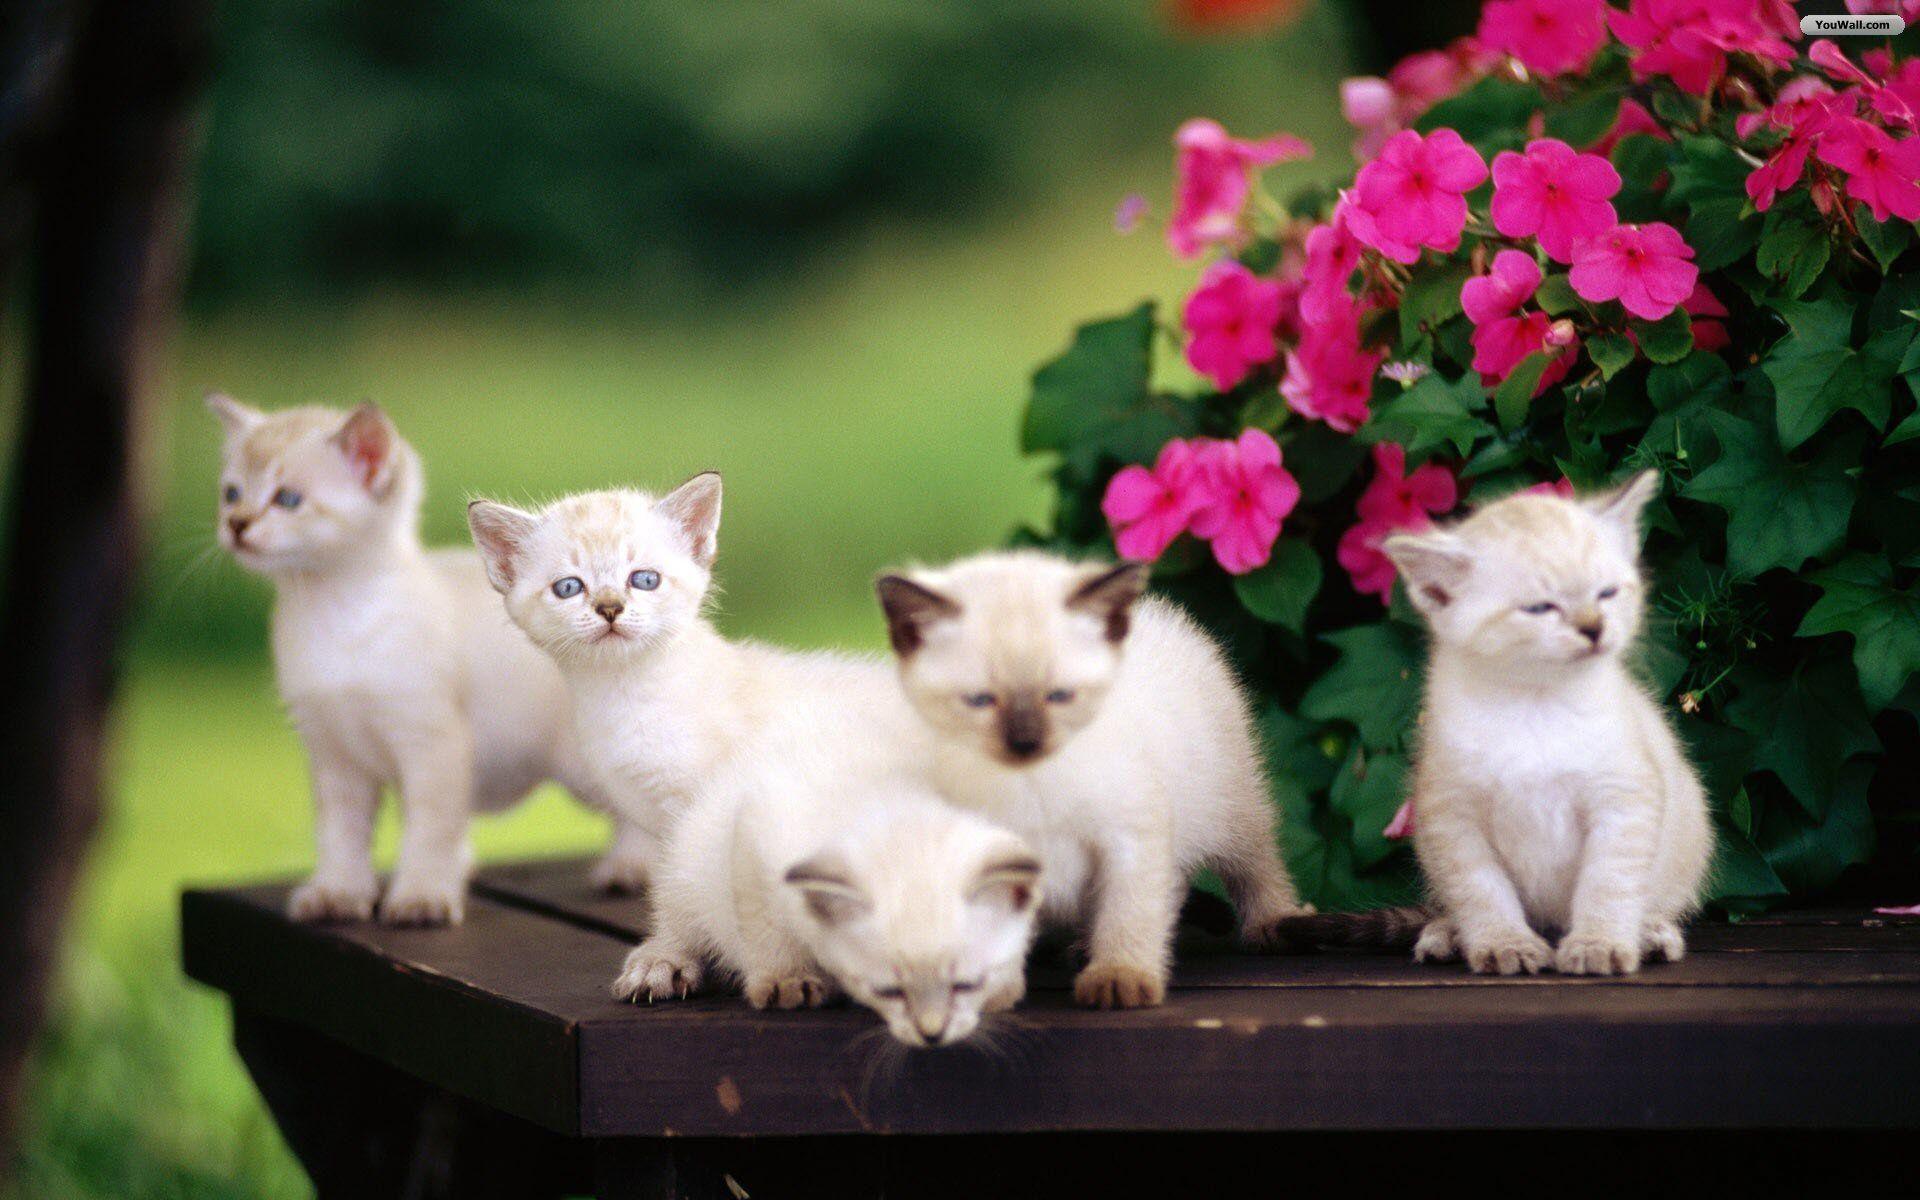 cute-wallpapers-kittens-7 - 2leepHD.